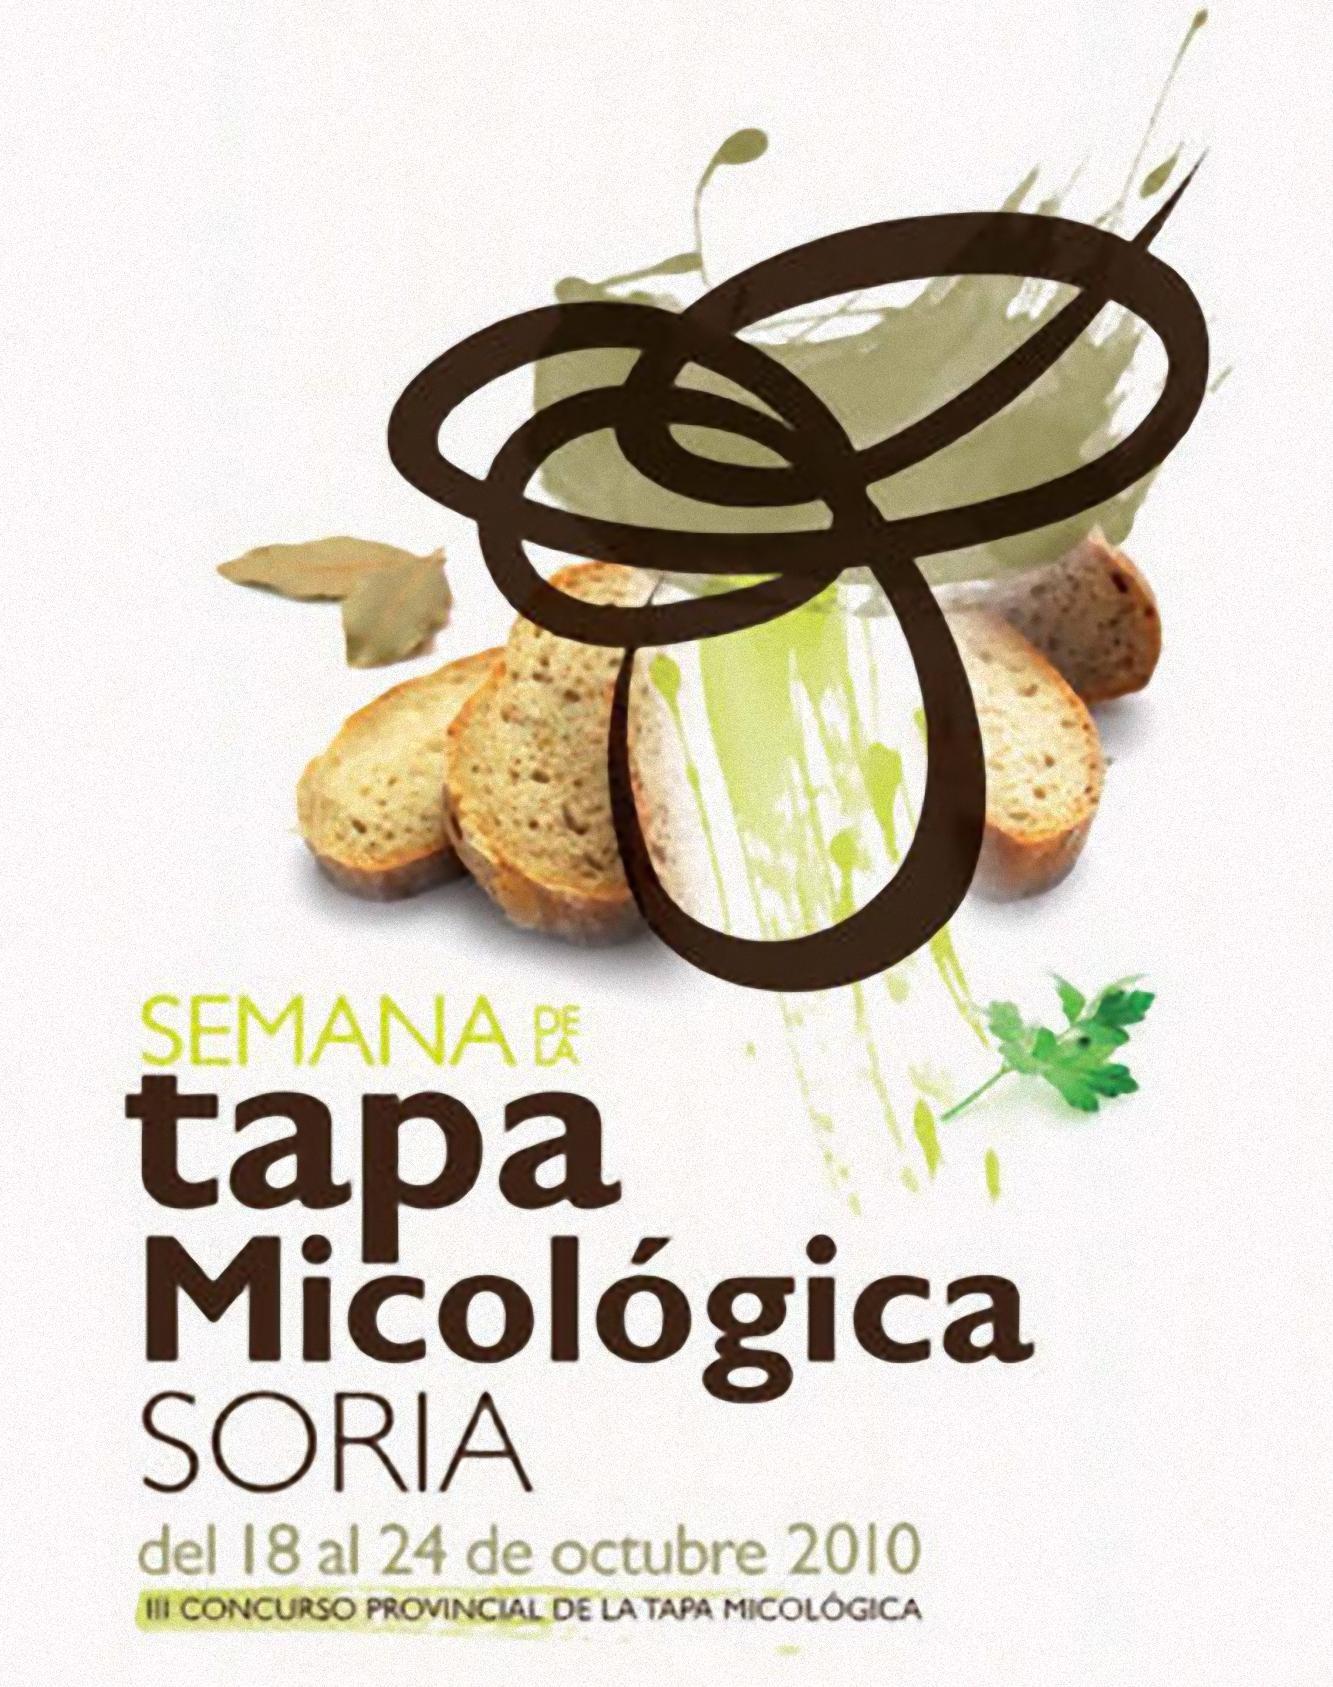 Cartel de la Semana de la tapa micologica soria